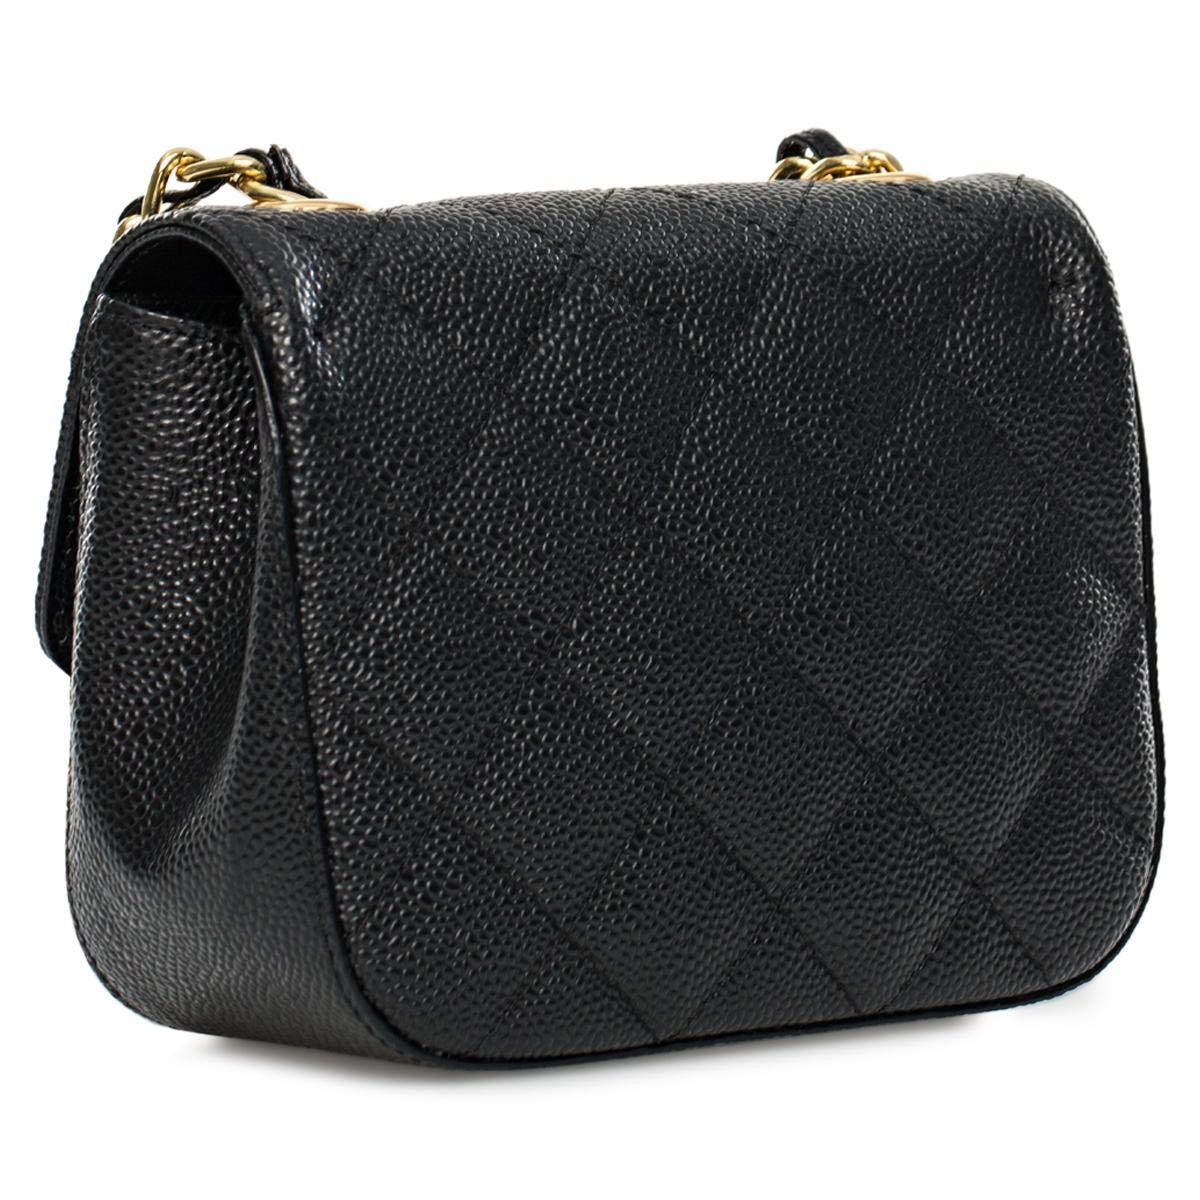 07da52fc5 Gianfranco Ferre F-00054619 Crossbody Bag for Women - Leather, Black:  Amazon.ae: GianfrancoFERRE